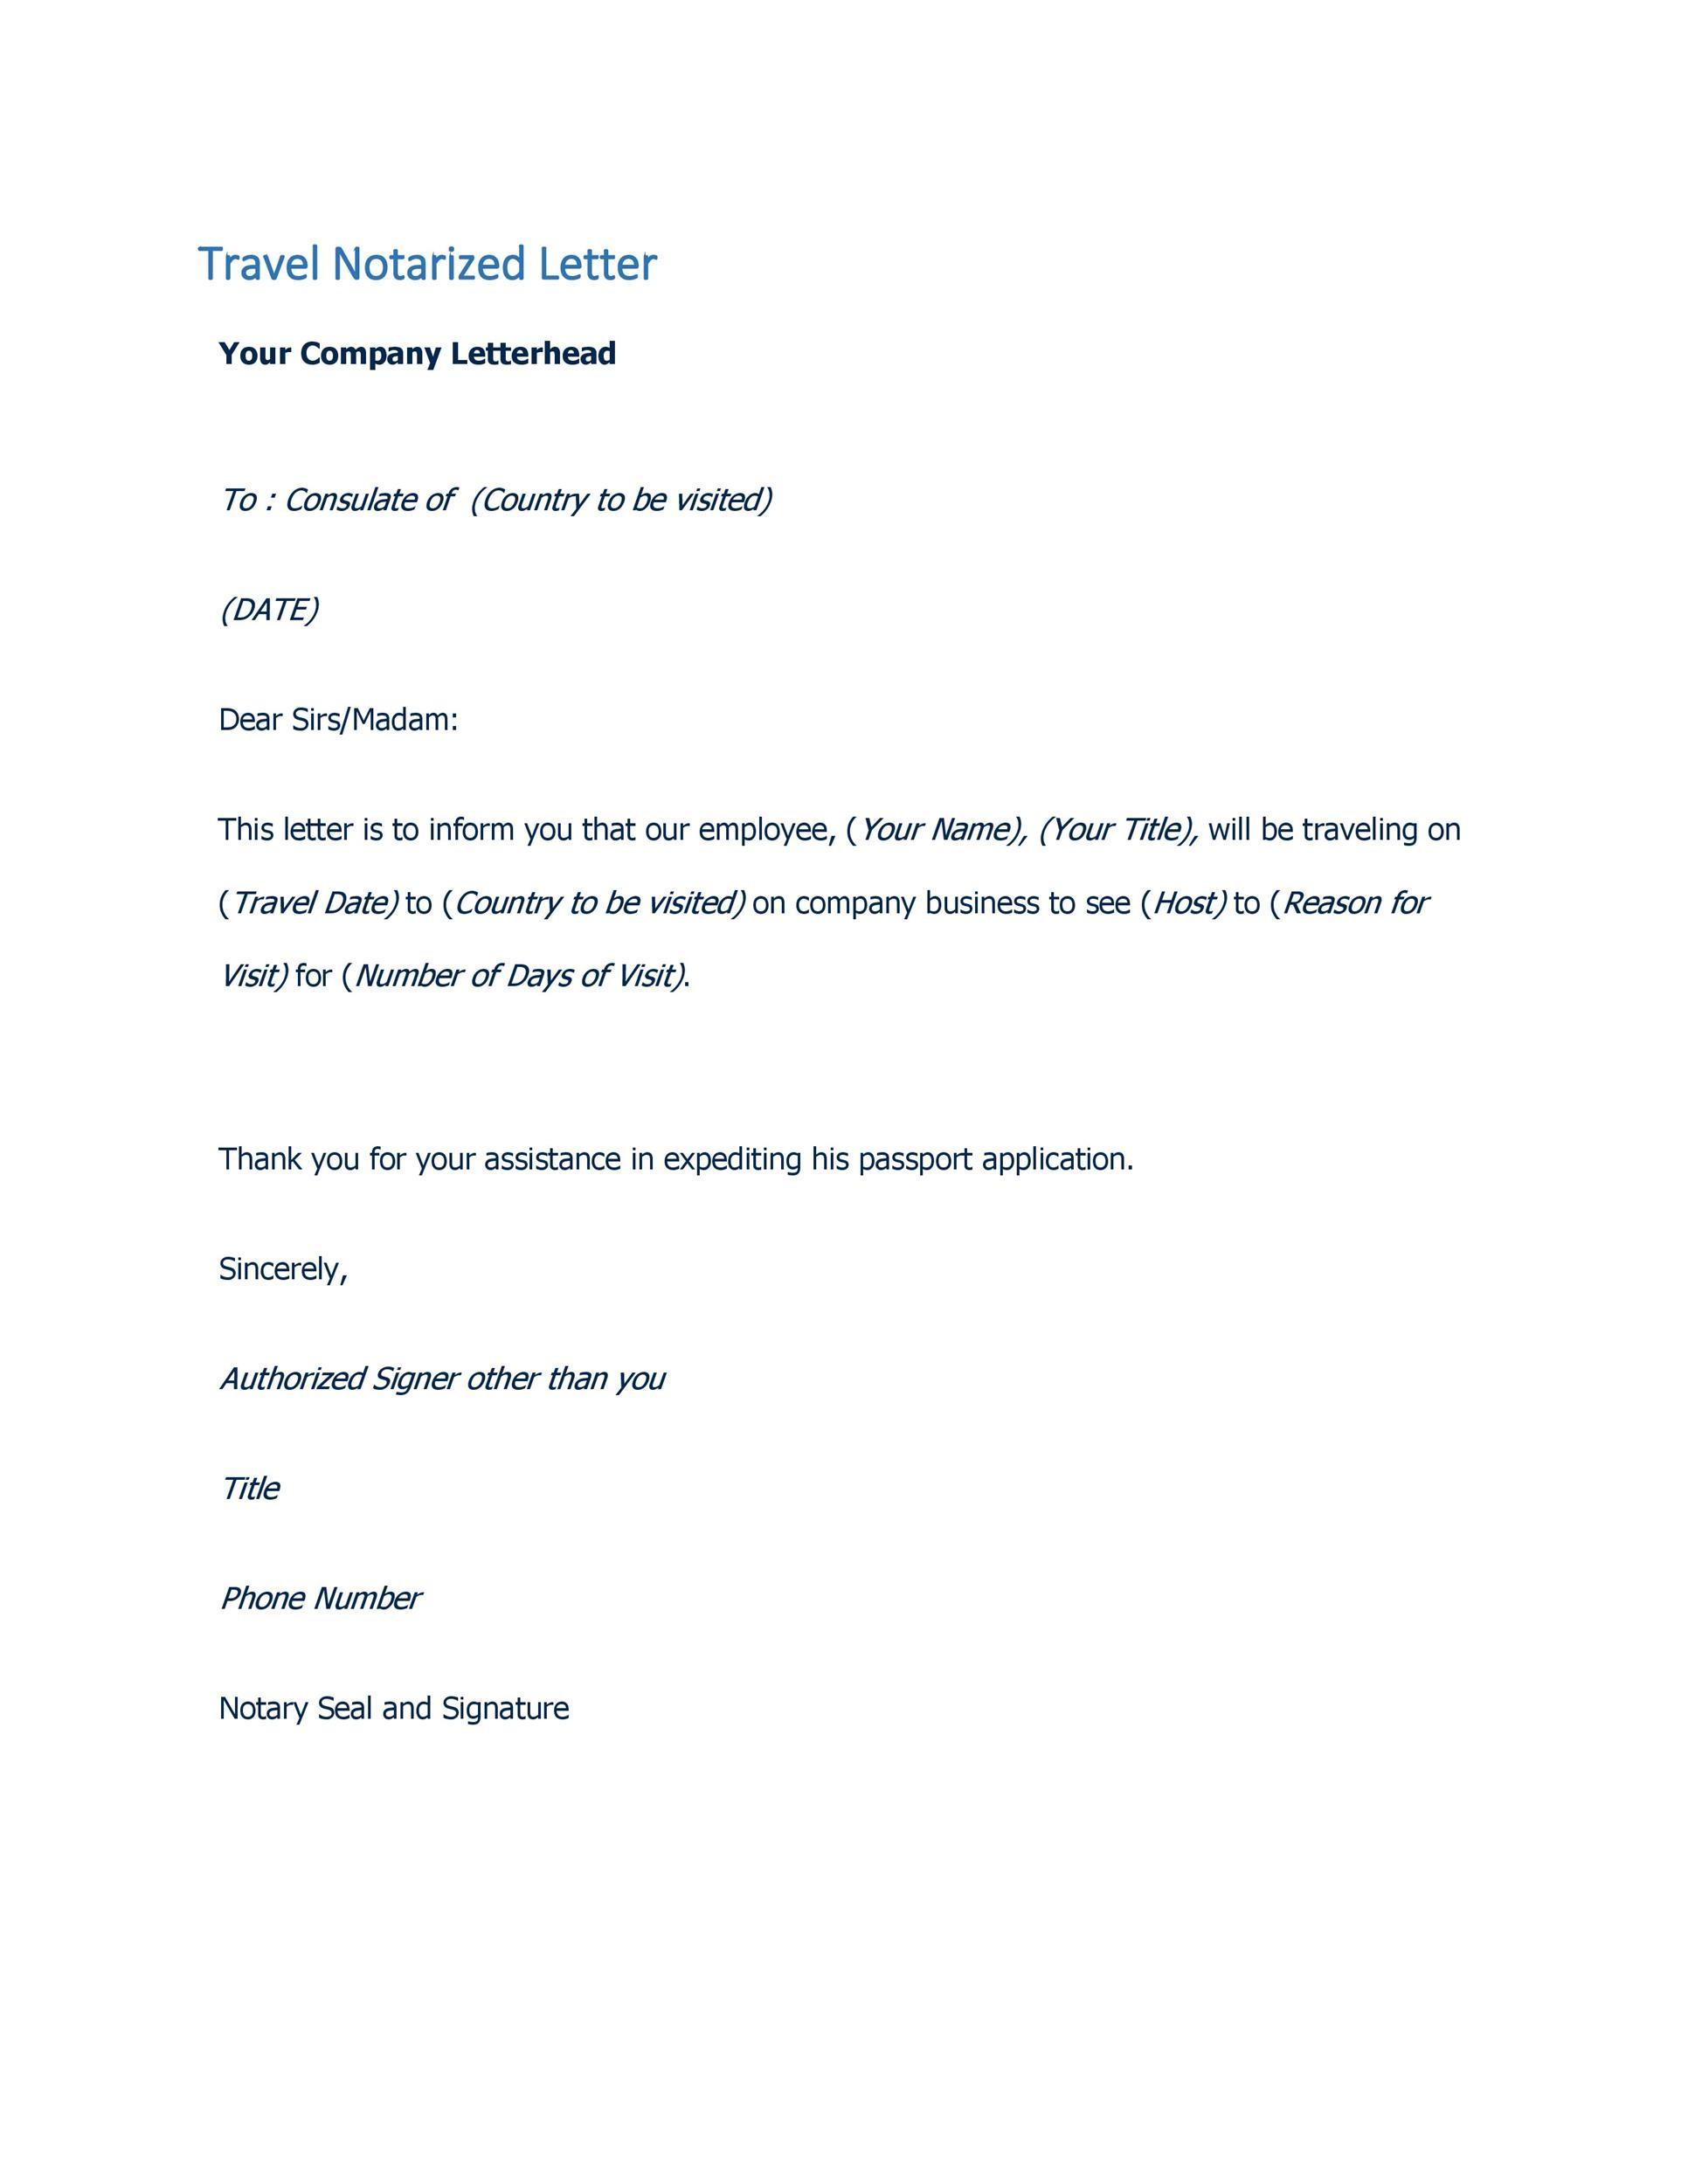 Permission to travel letter template resume template notarized letter sample parents consent letter template for permission to travel letter template altavistaventures Images